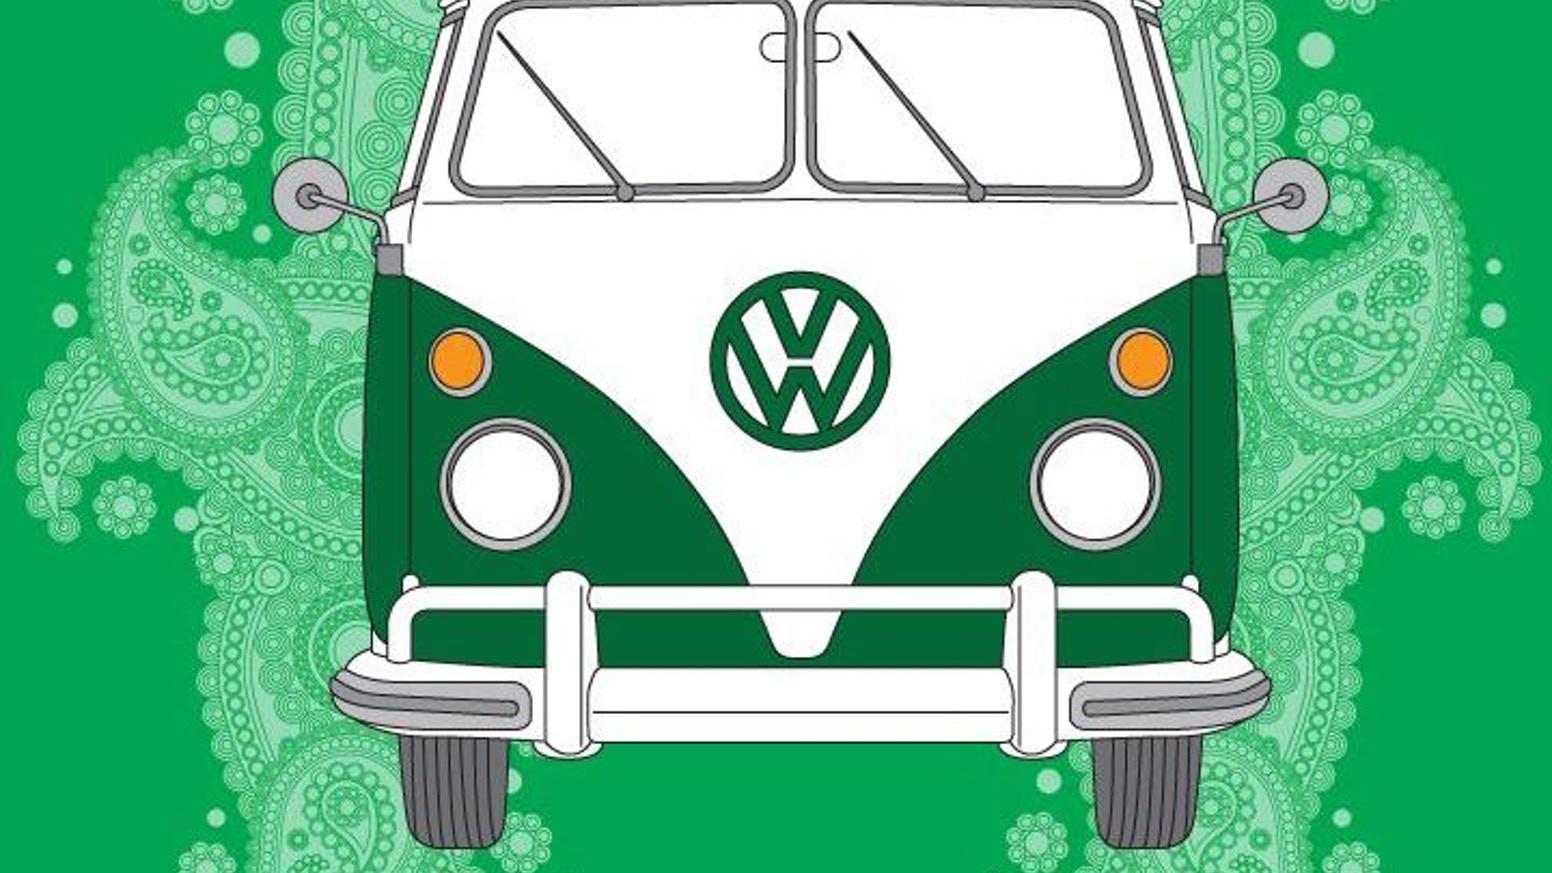 Sudan roadsters clipart image royalty free stock Hippie Van by Robert J. Luther — Kickstarter image royalty free stock